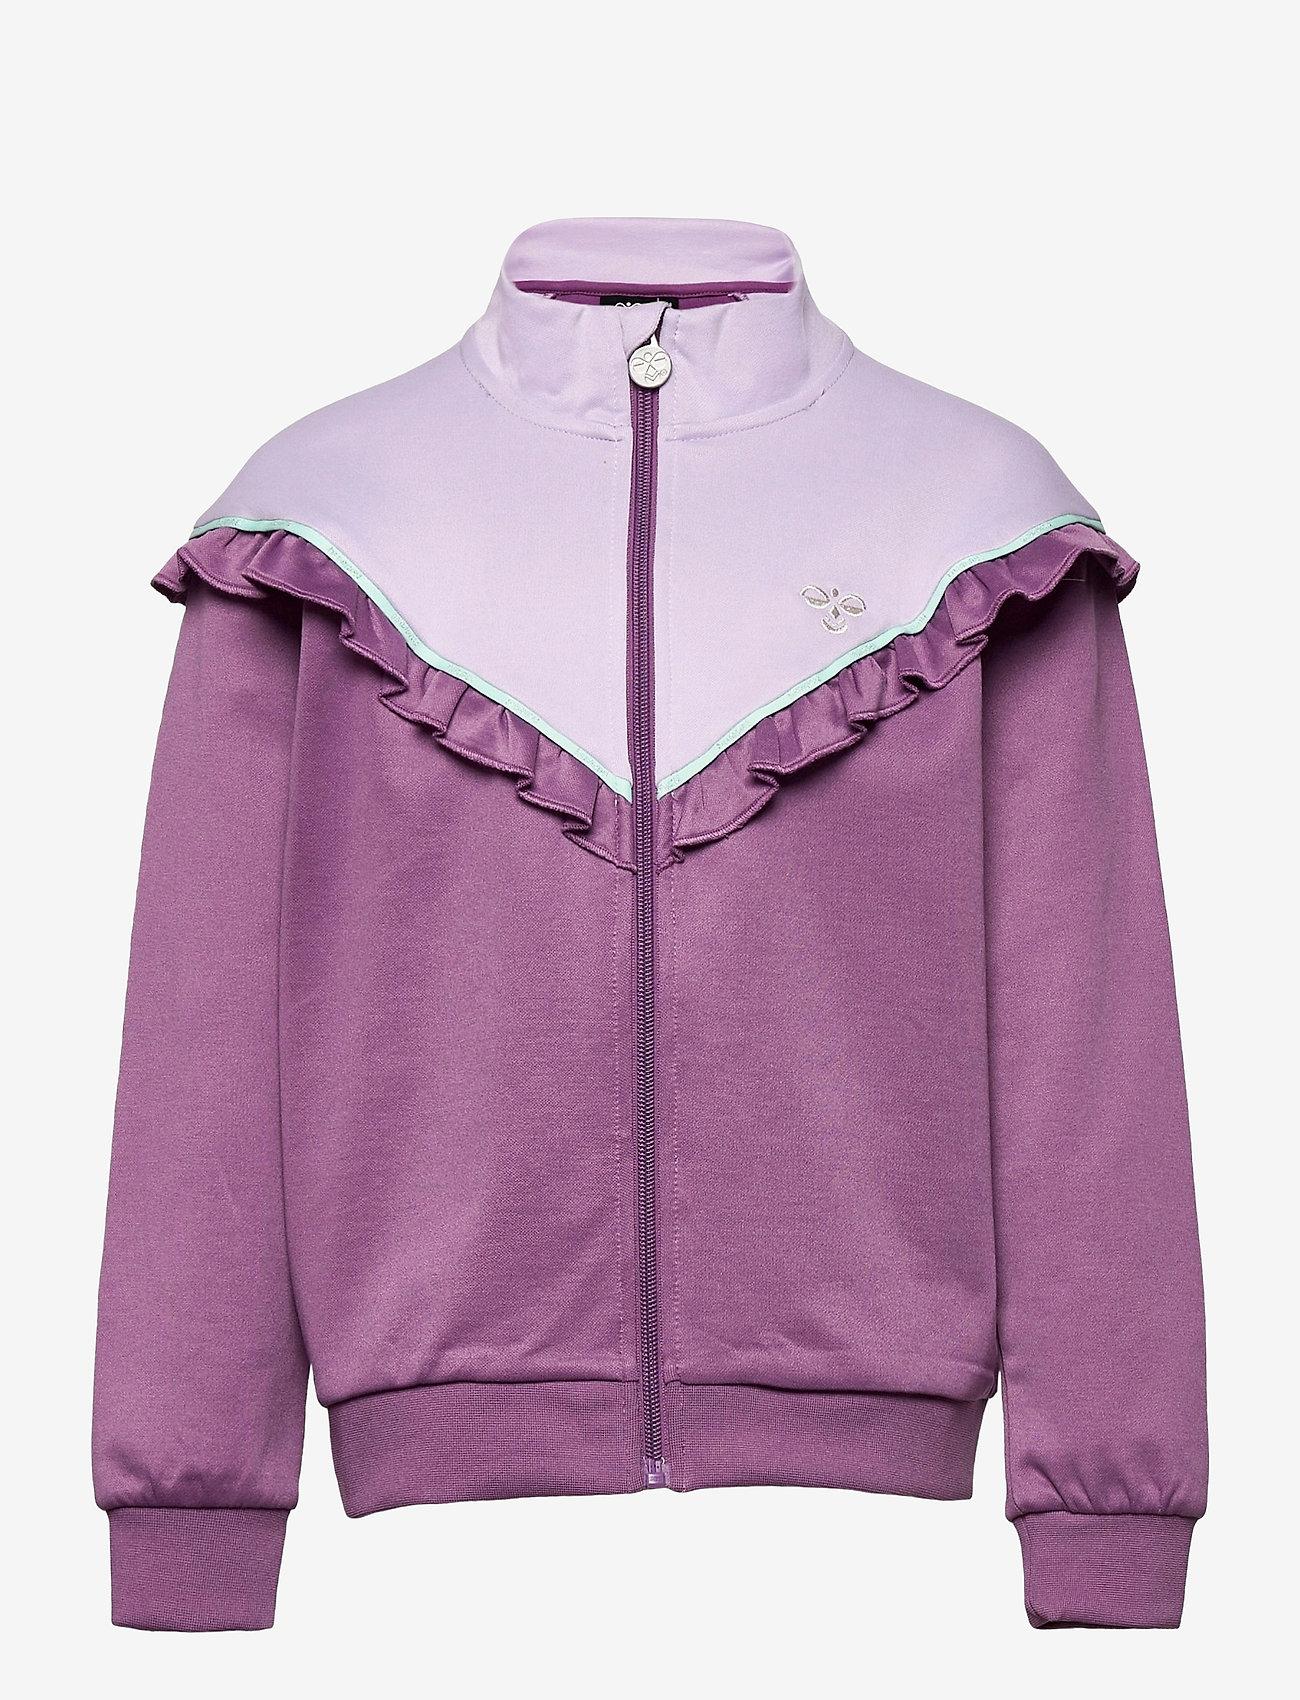 Hummel - hmlJEWEL ZIP JACKET - sweatshirts - chinese violet - 0